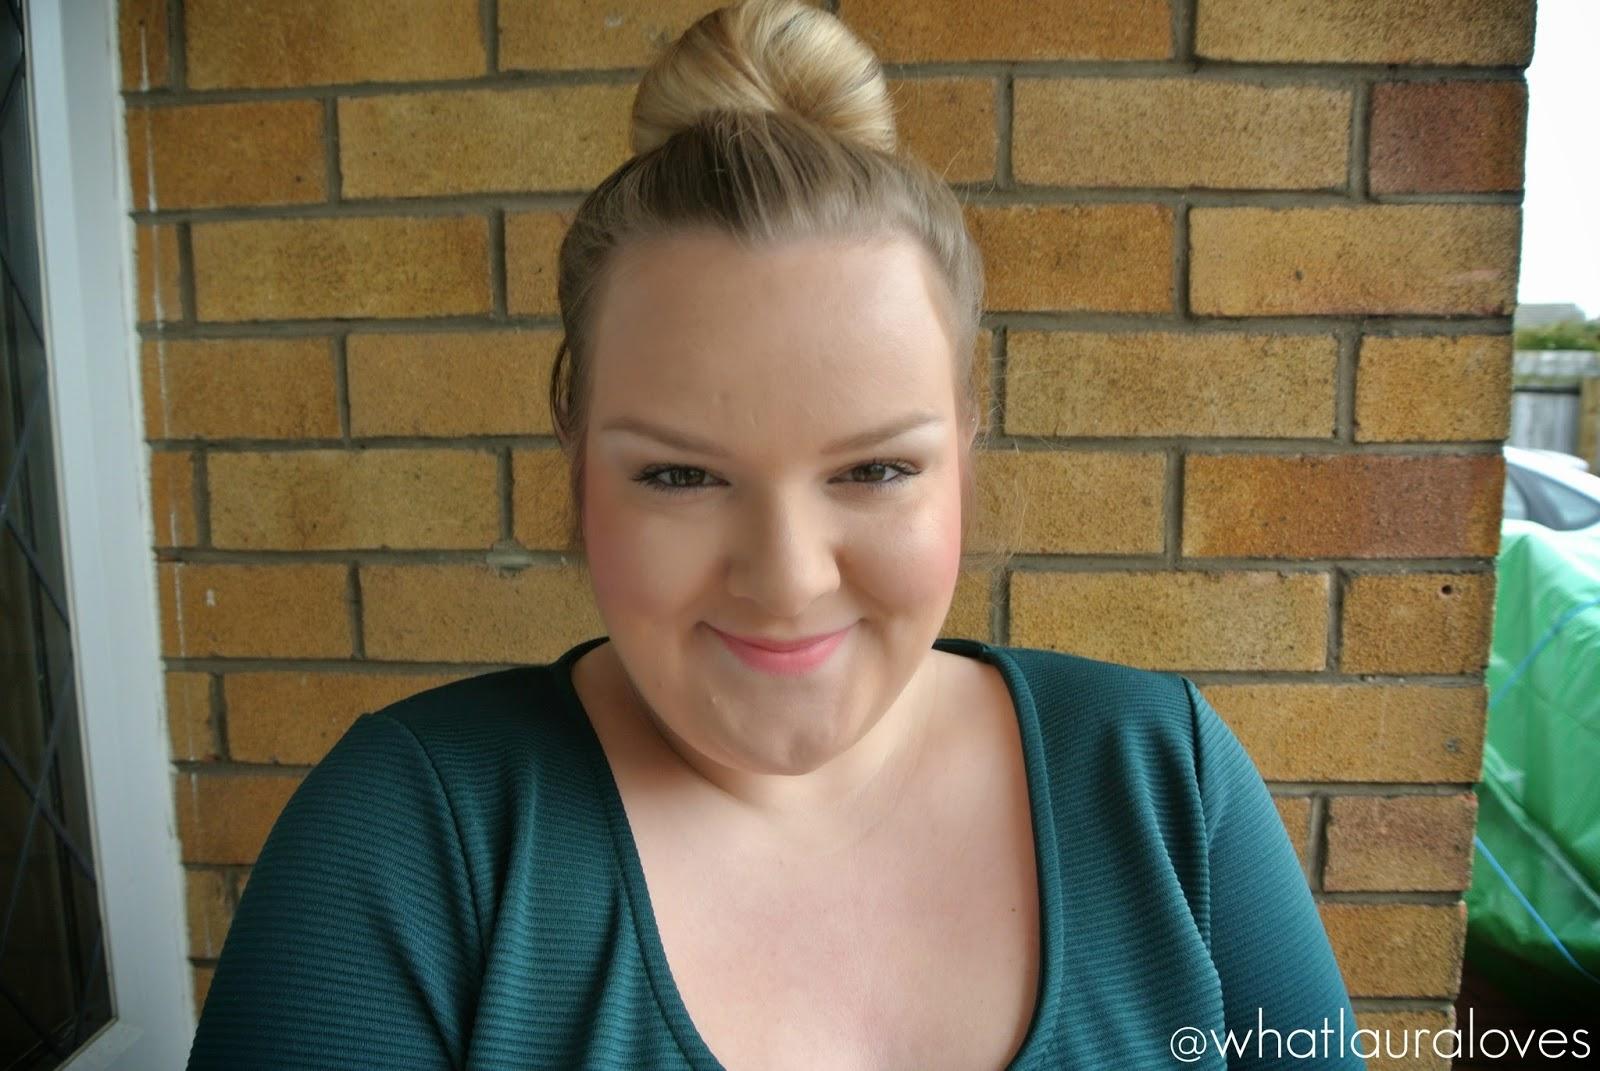 Makeup Revolution The One Blush Stick in Matte Rush worn on cheeks